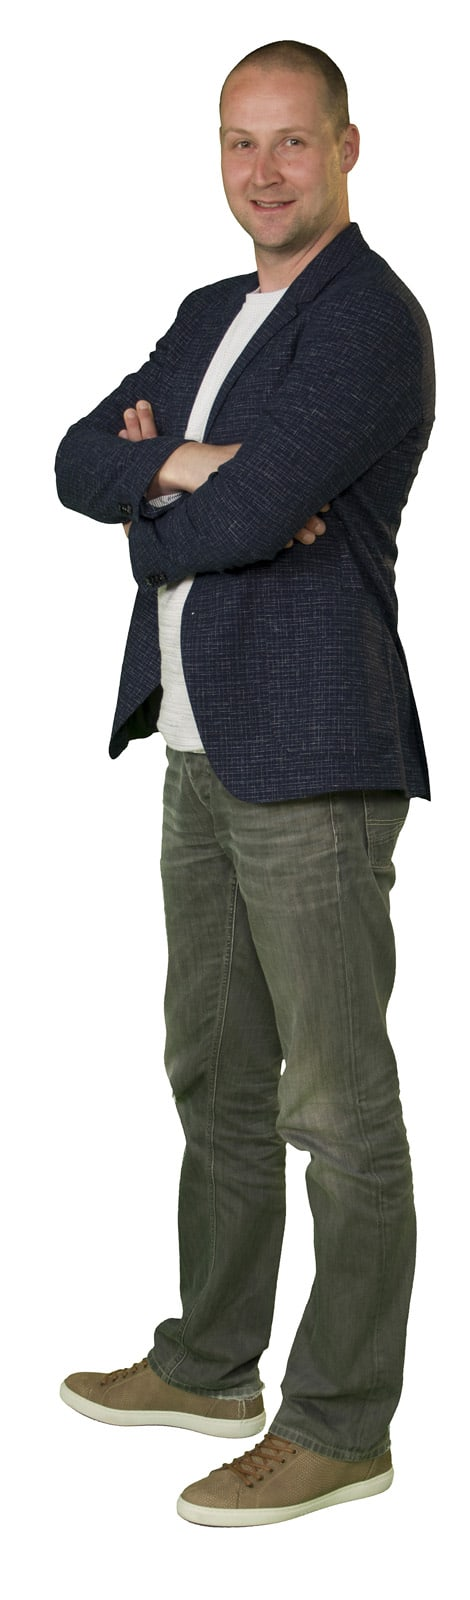 Martin Dunnink